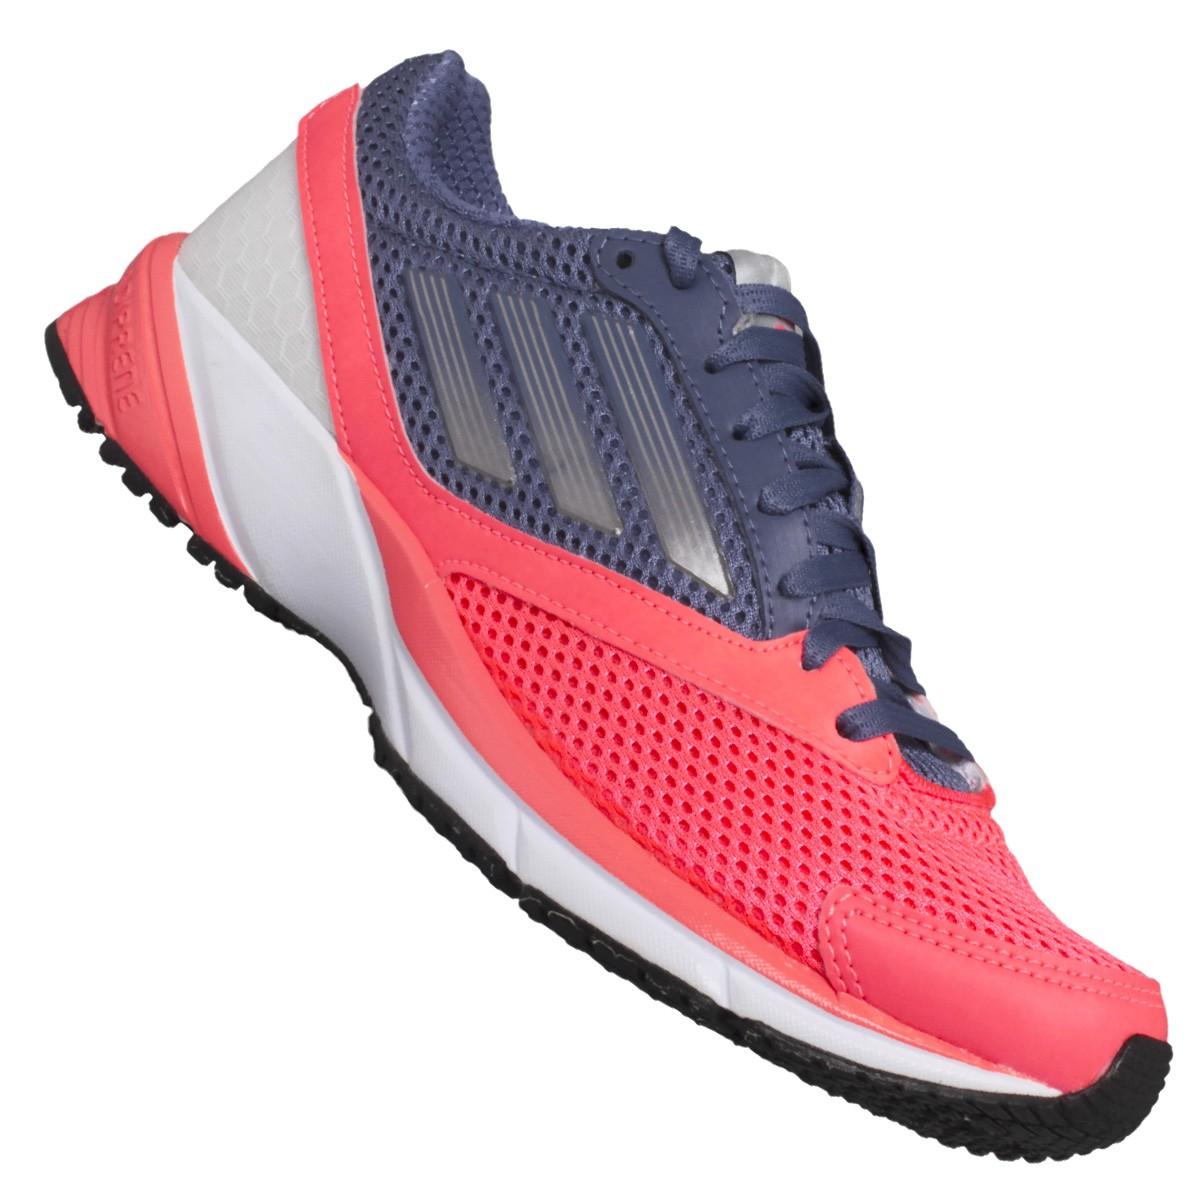 9a1b901eead Tênis Adidas Lite Arrow - Feminino